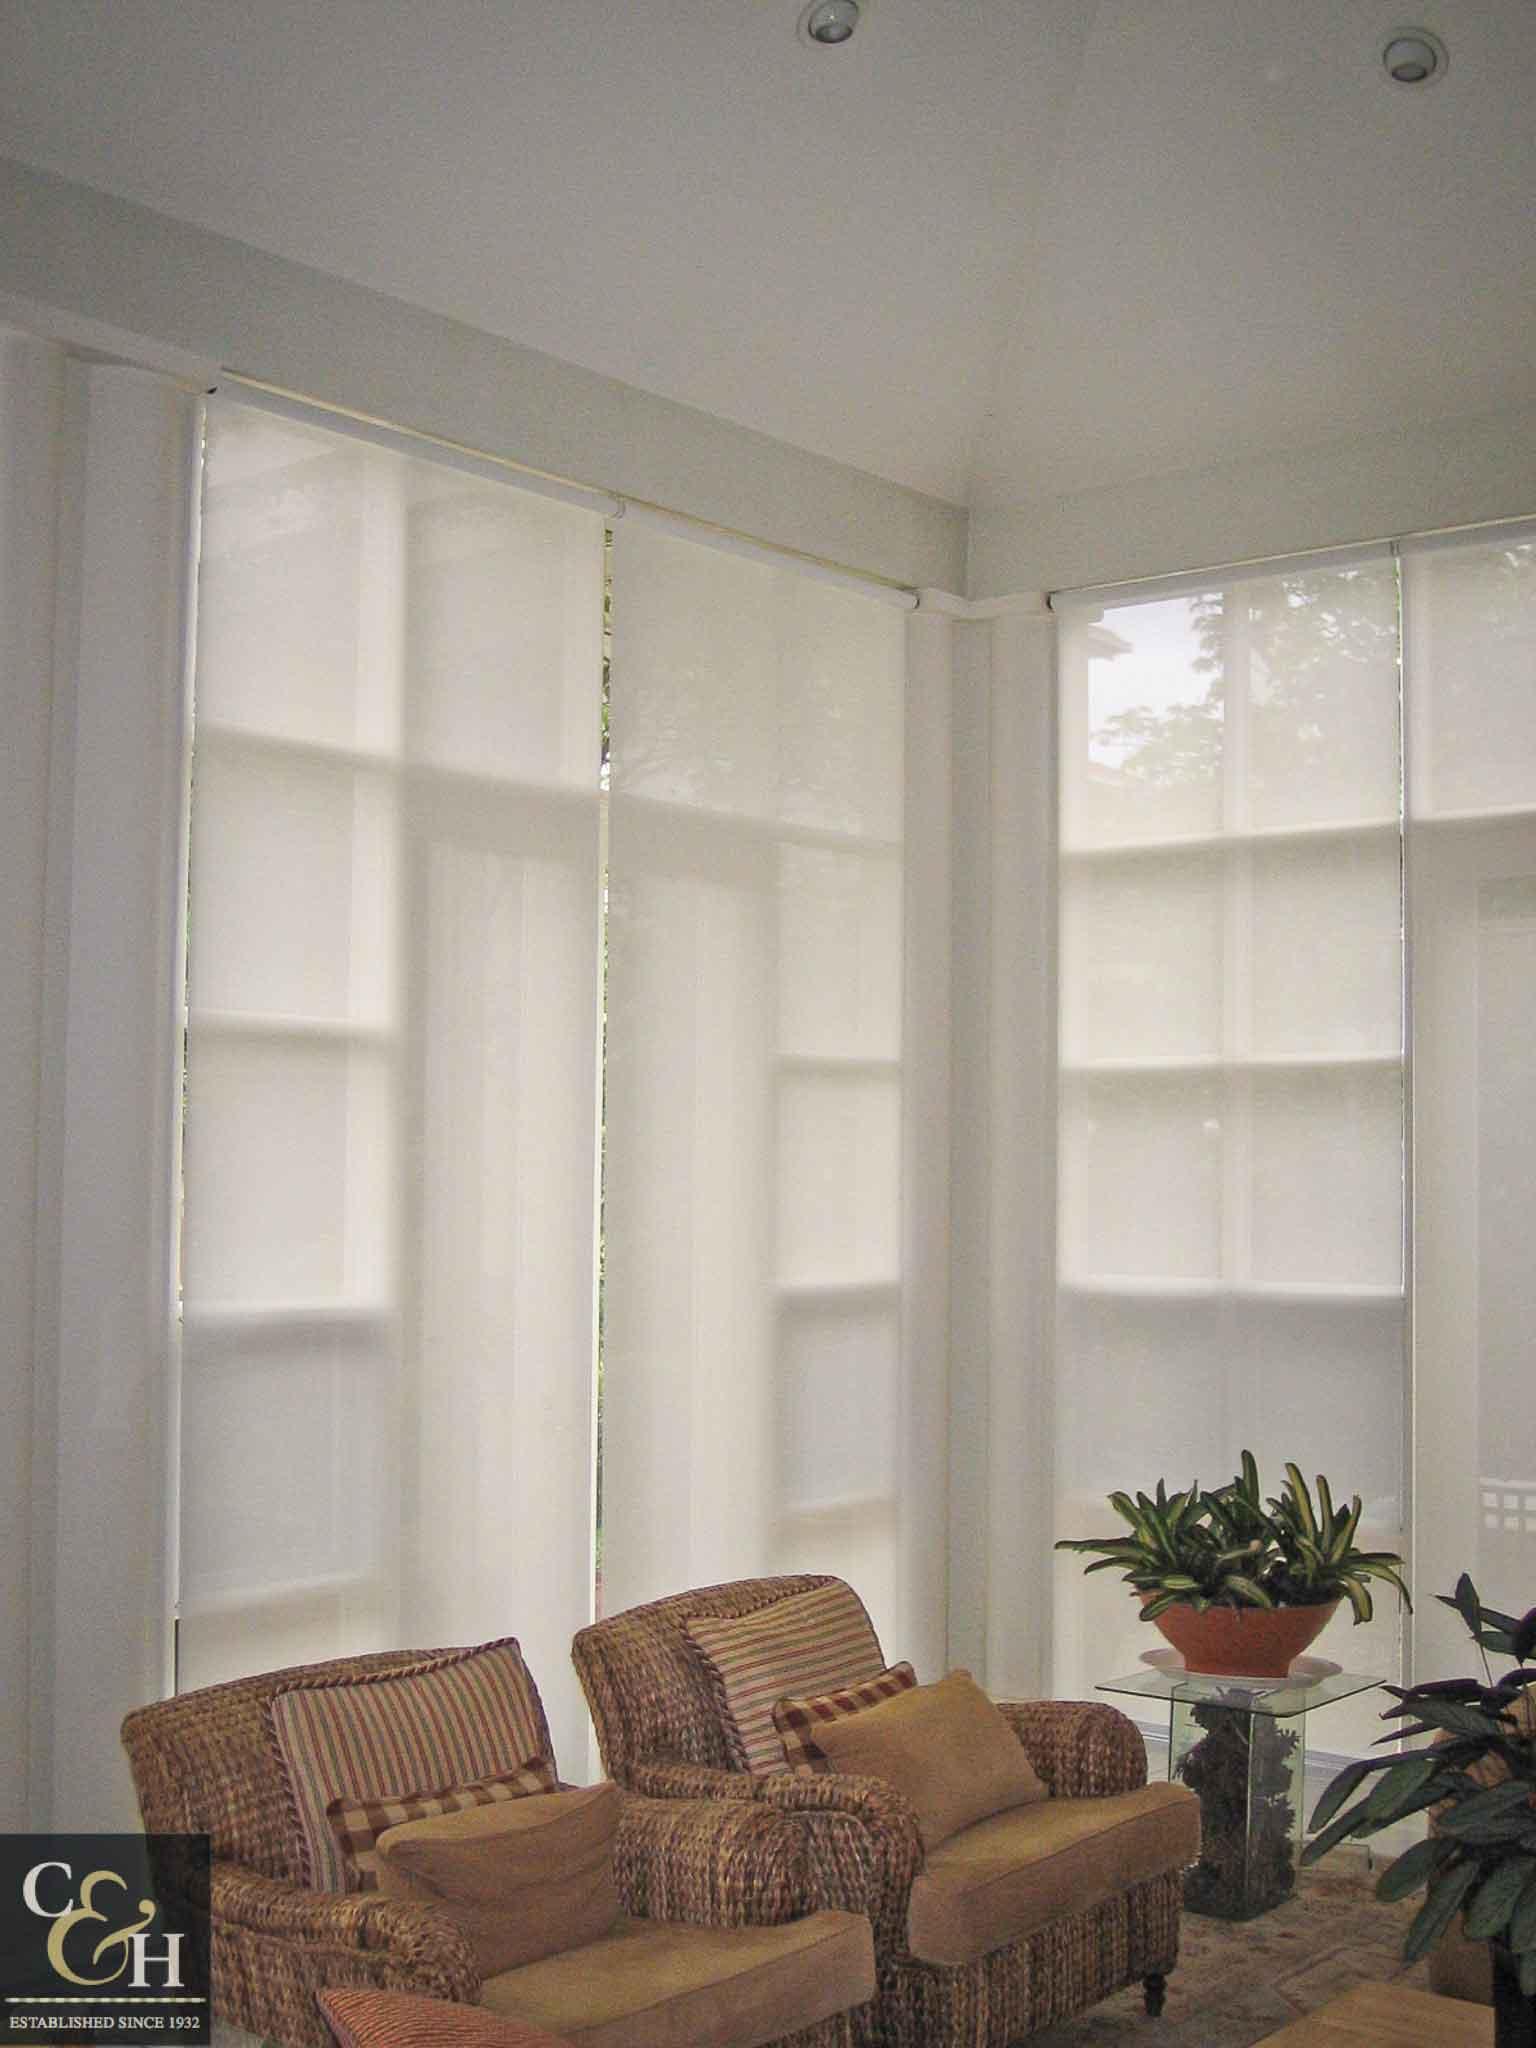 Screen-Roller-Blinds-17 inside a living room